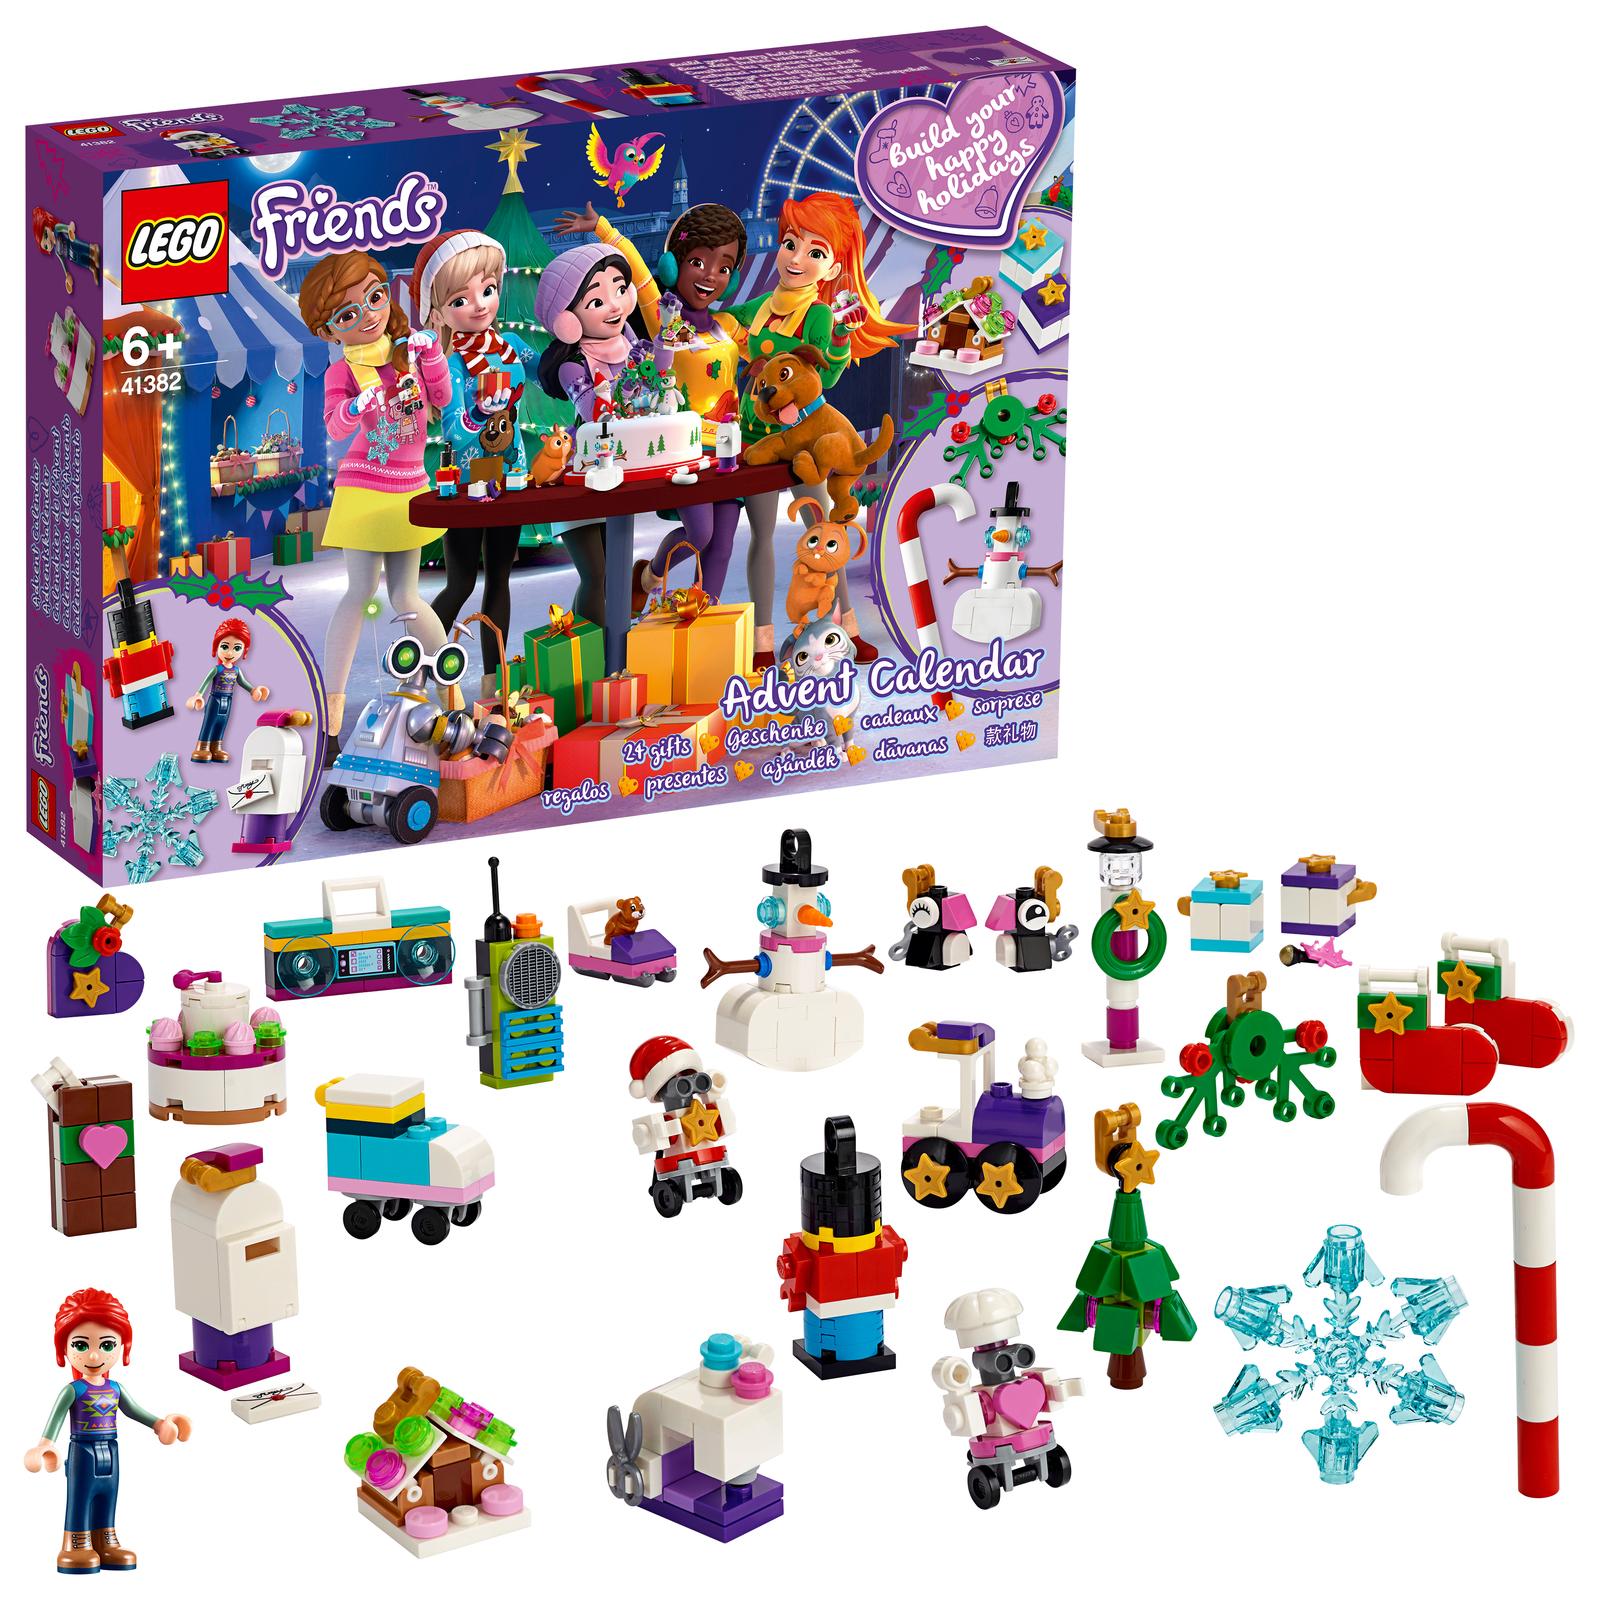 LEGO Friends - 2019 Advent Calendar (41382) image